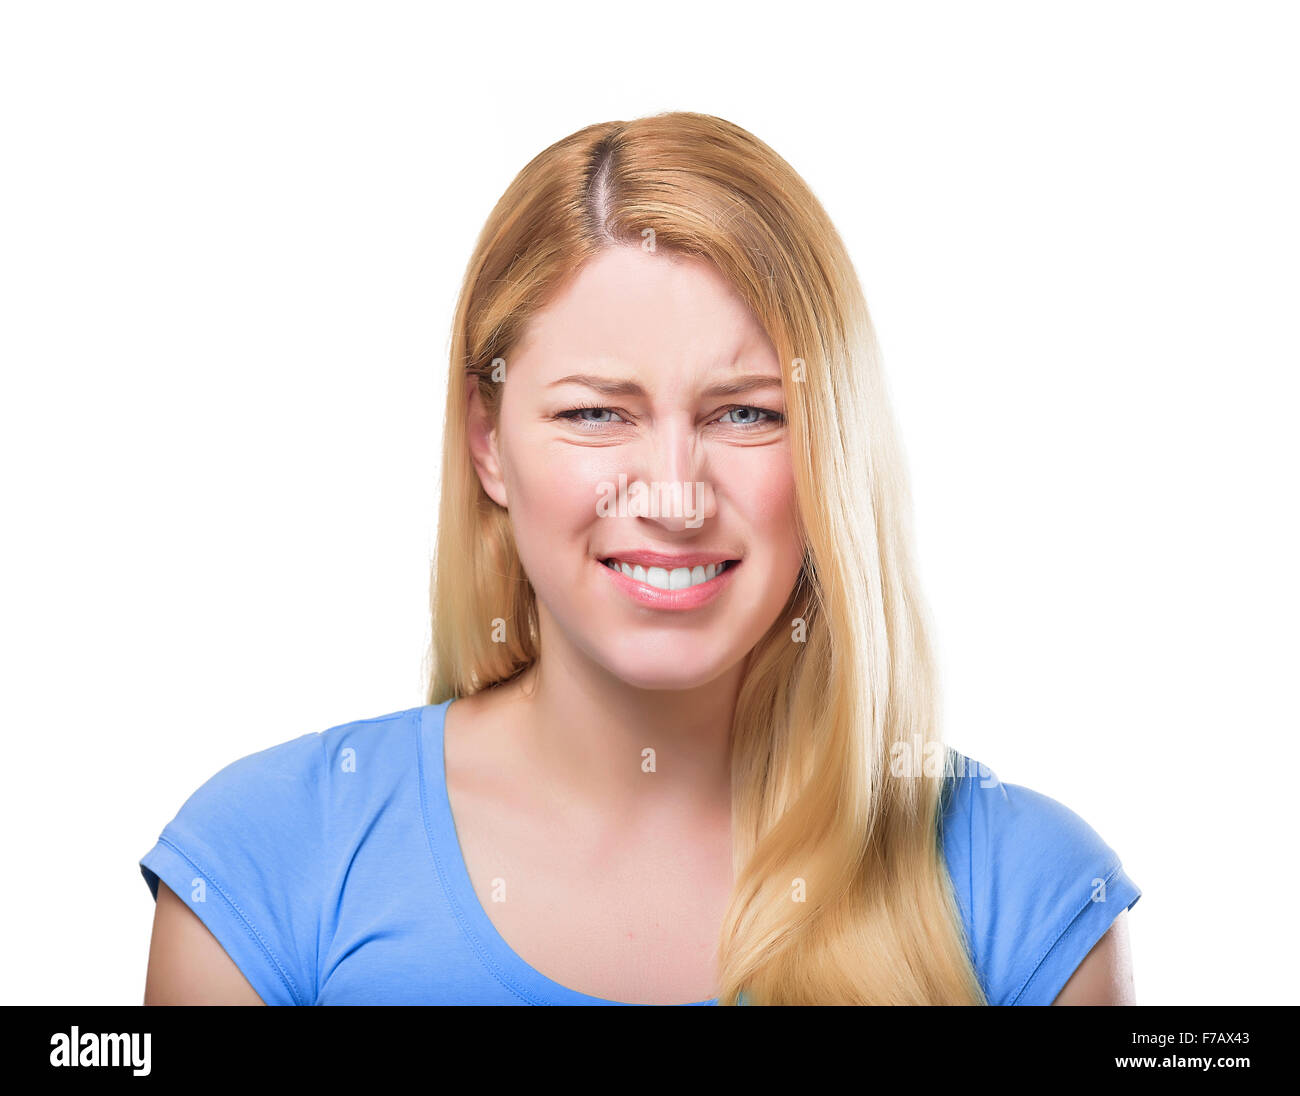 Blonde woman grimacing. - Stock Image